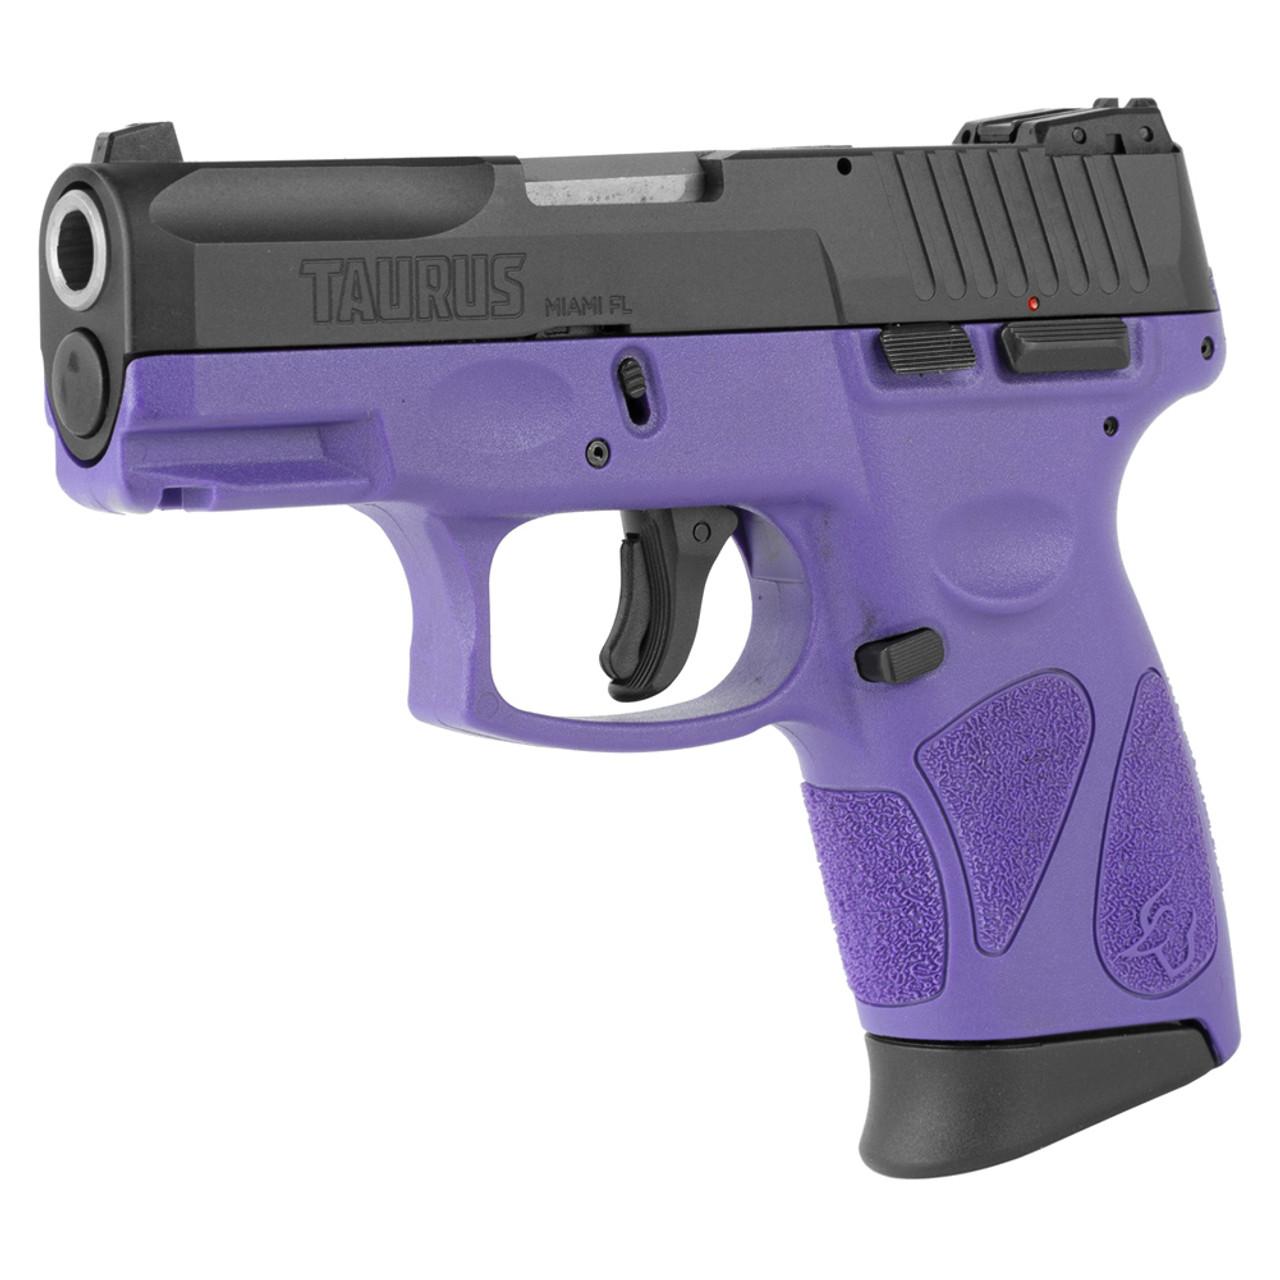 TAURUS G2c 9mm 3 25in 2x 12rd Dark Purple Black Pistol (1-G2C931-12DP)